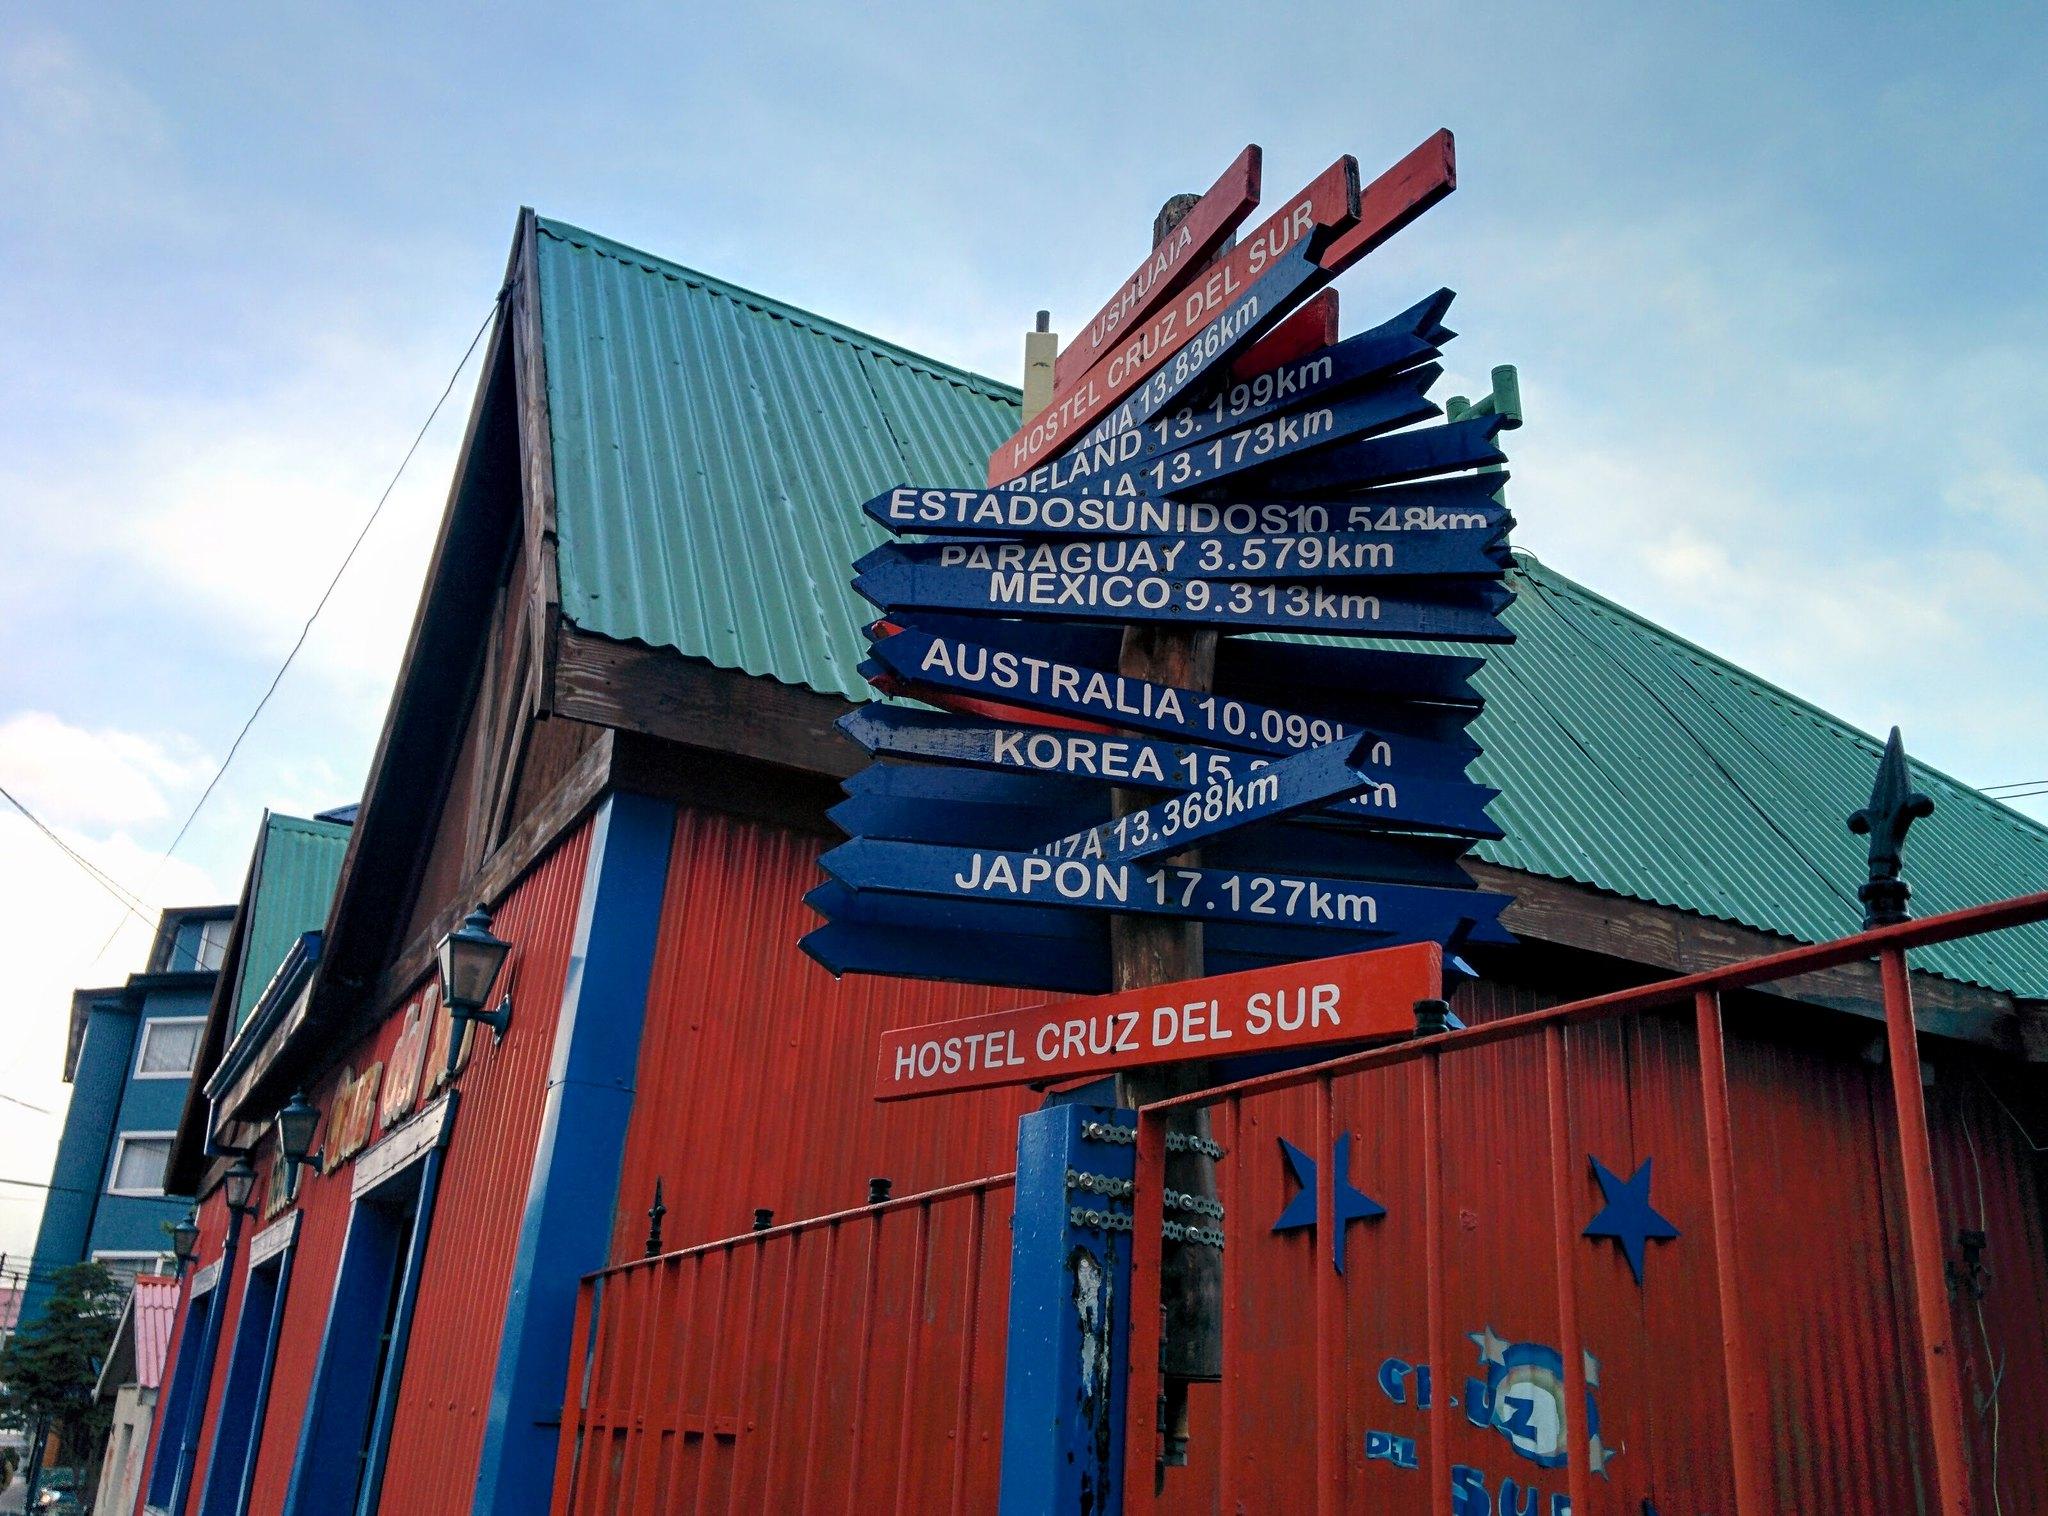 A sign outside Hostal Cruz del Sur